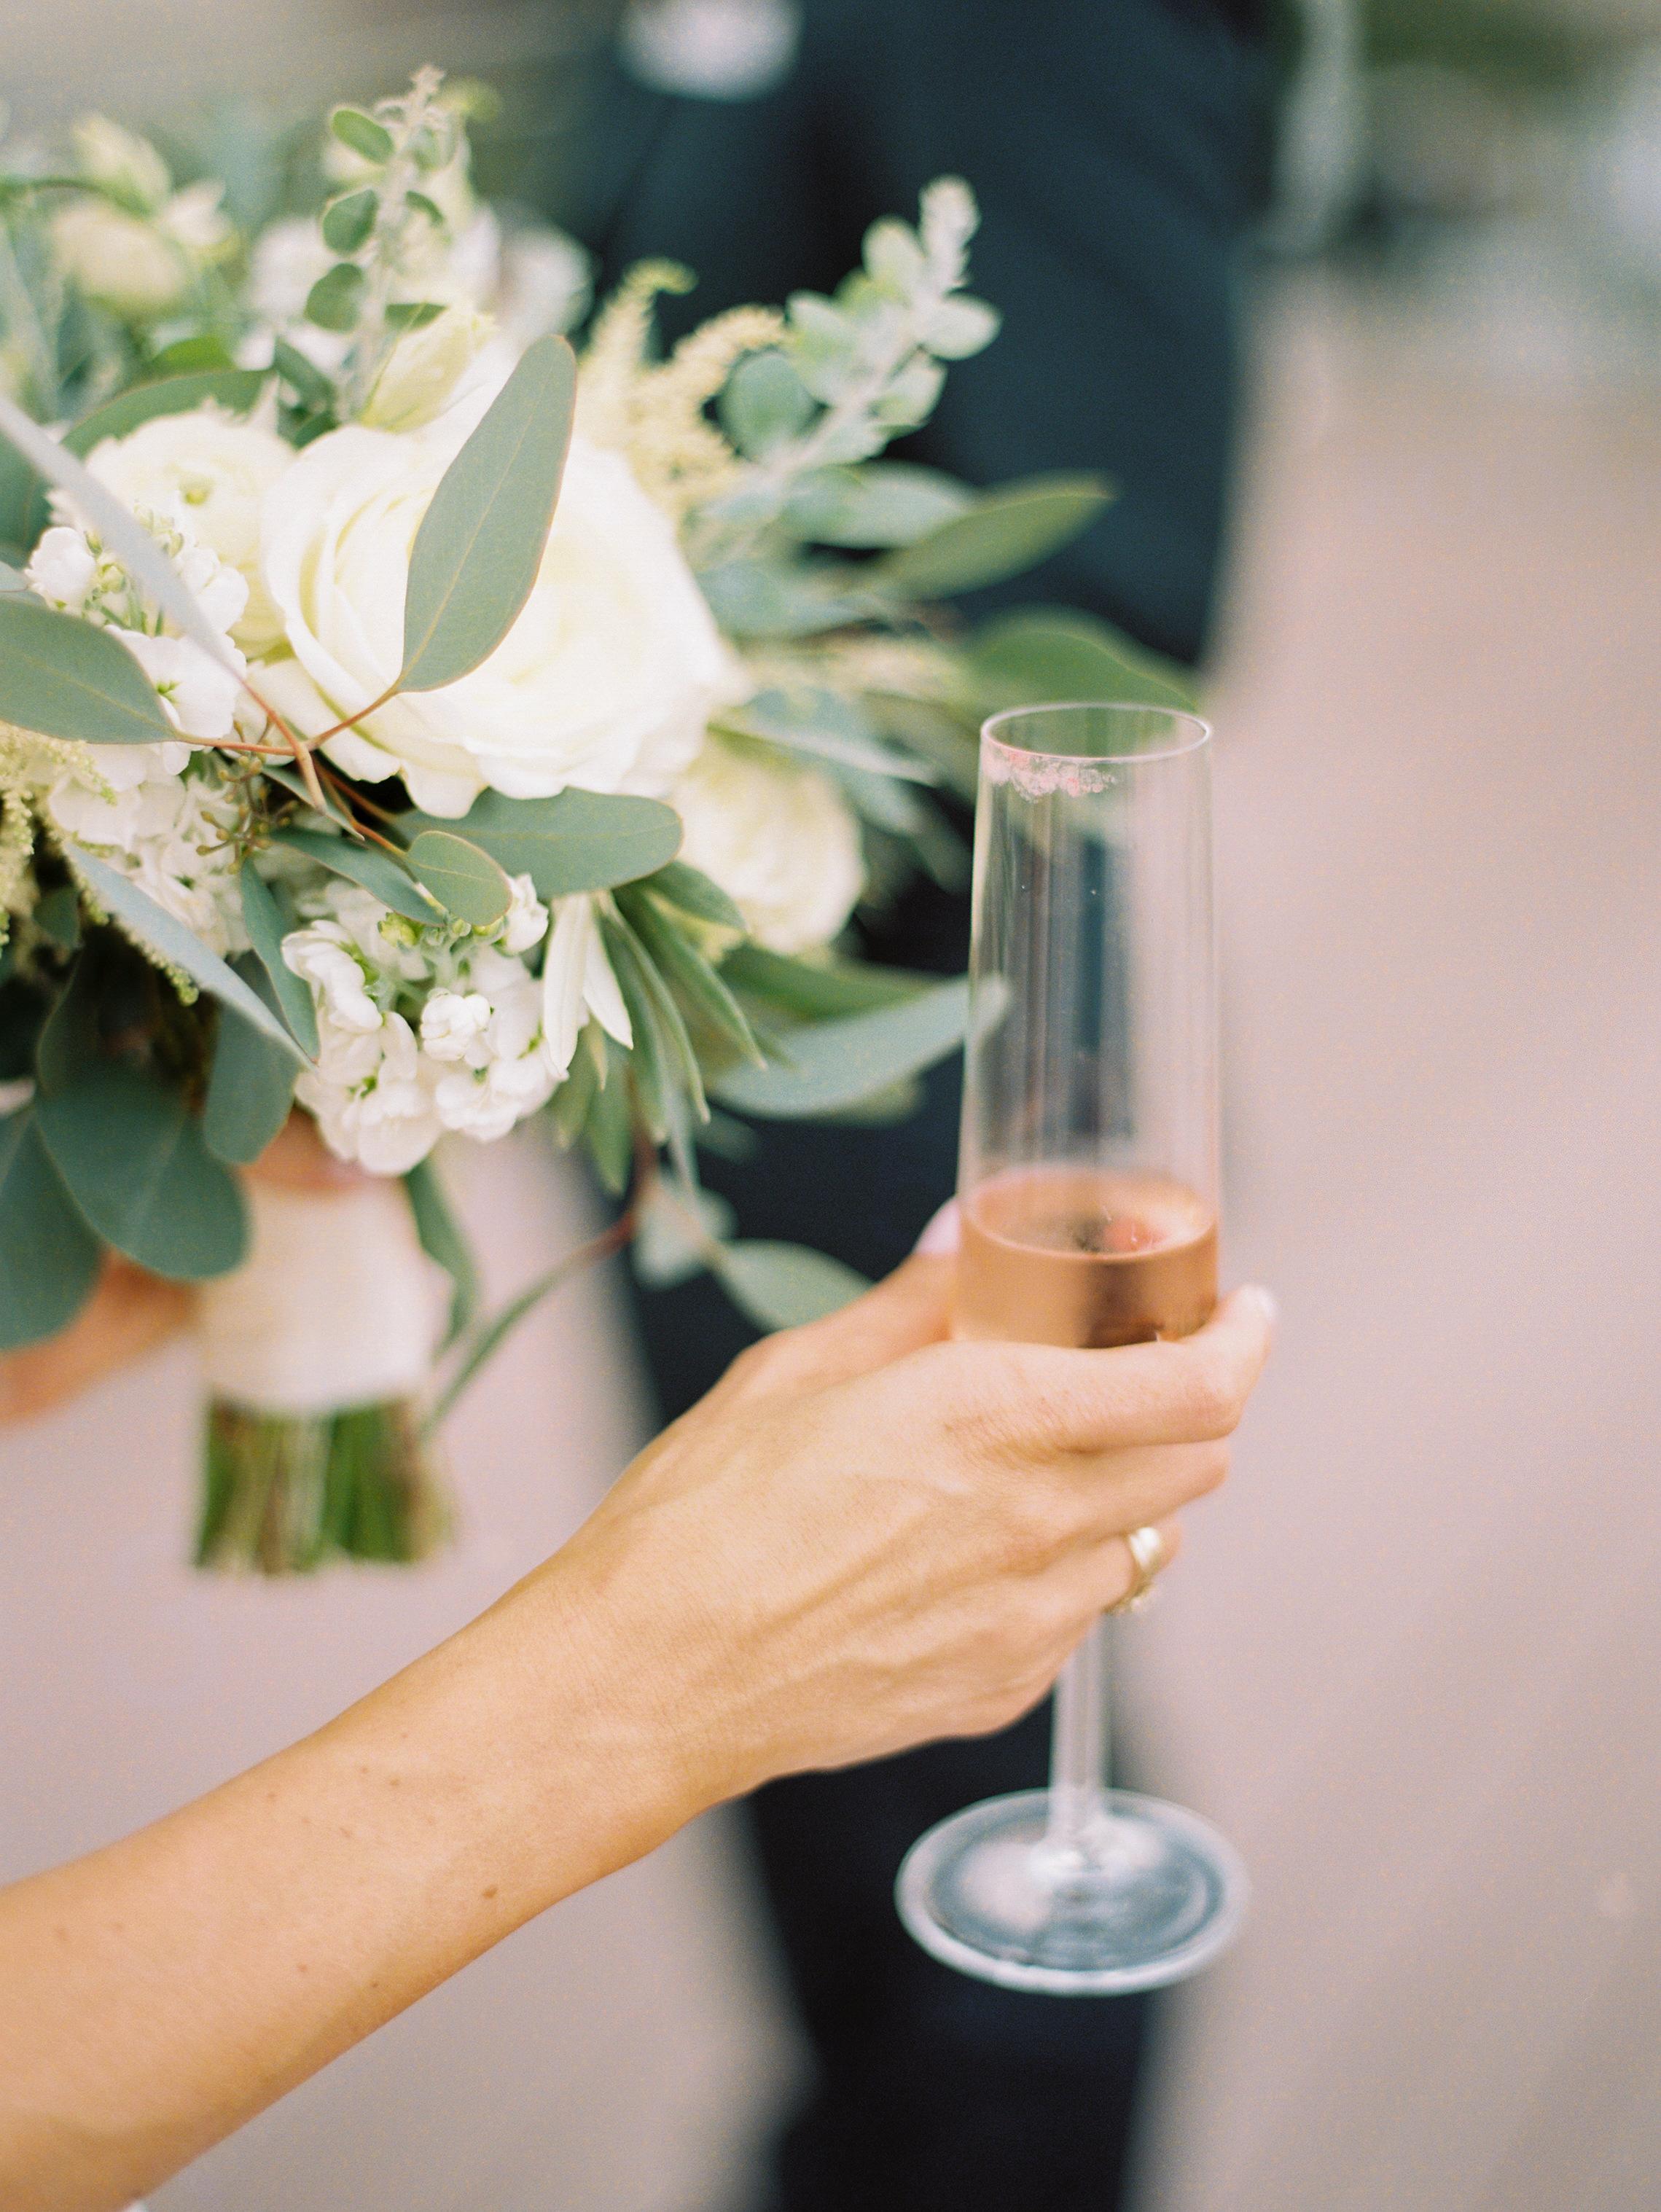 02_jukes_wedding-043.JPG